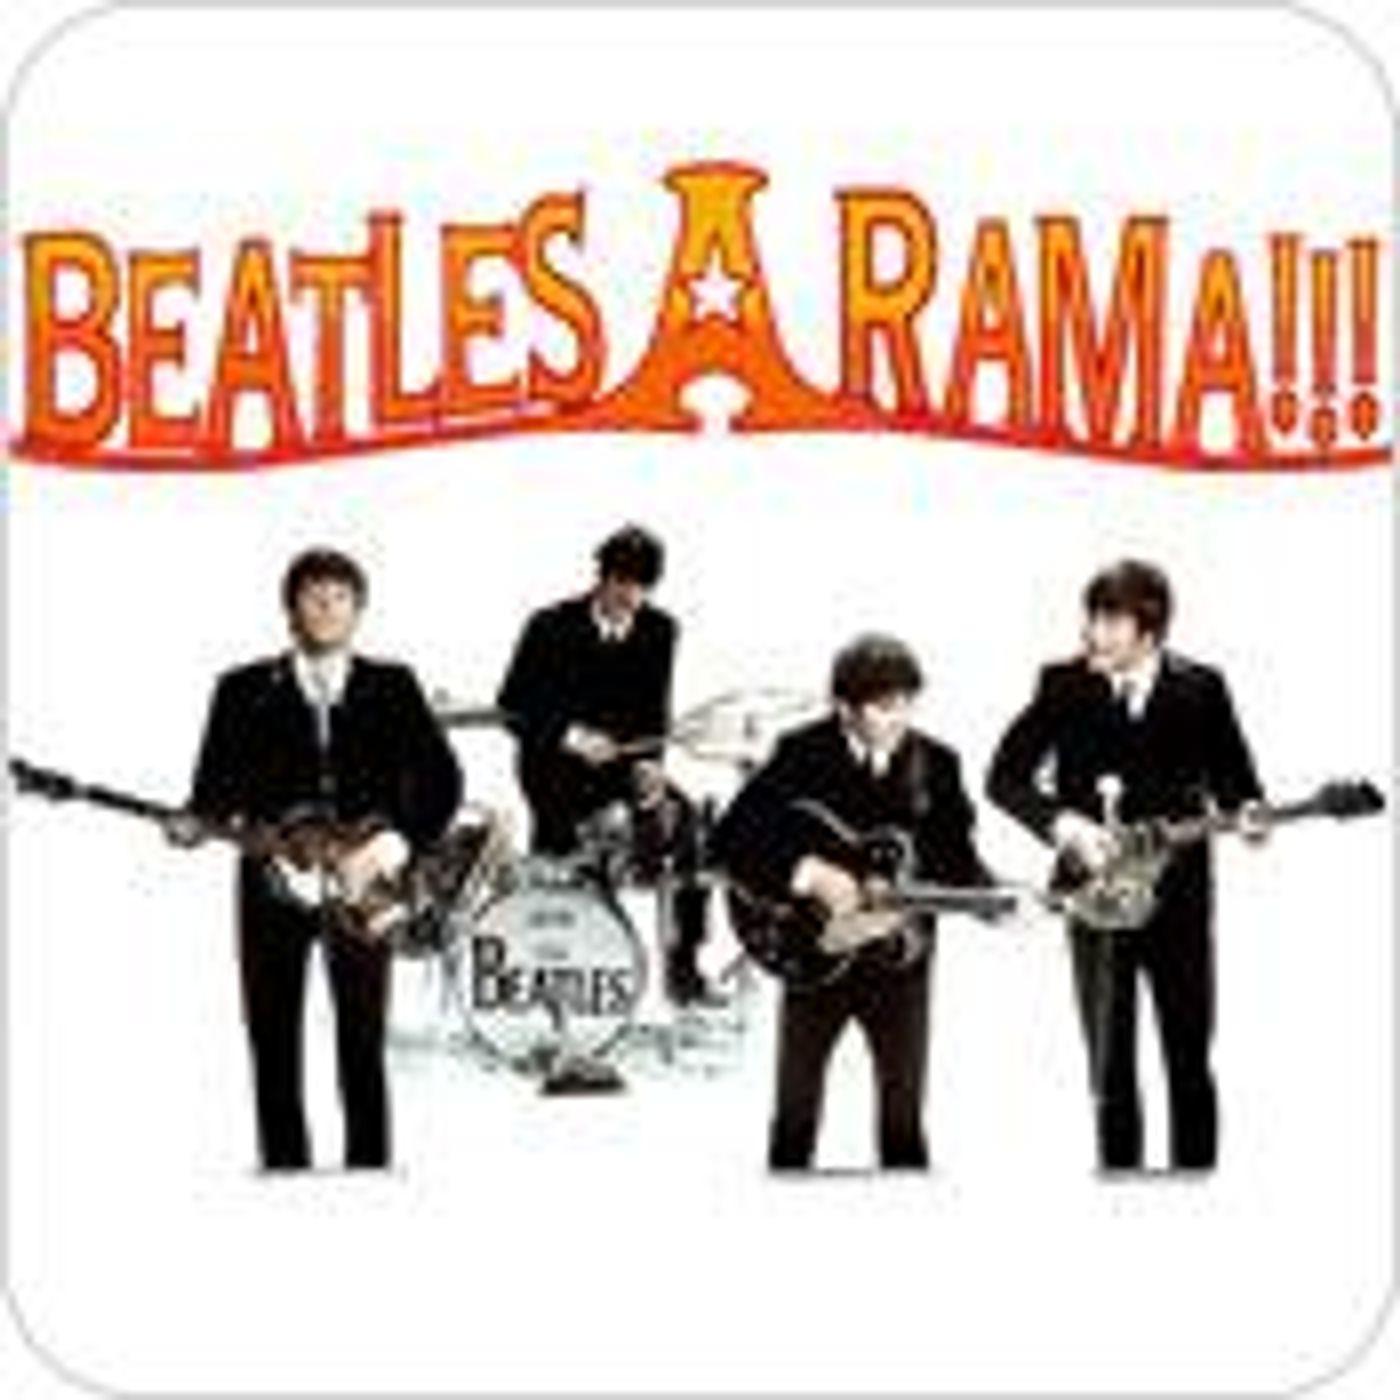 KCAA: Beatles-a-Rama (Sun, 13 Jun, 2021)